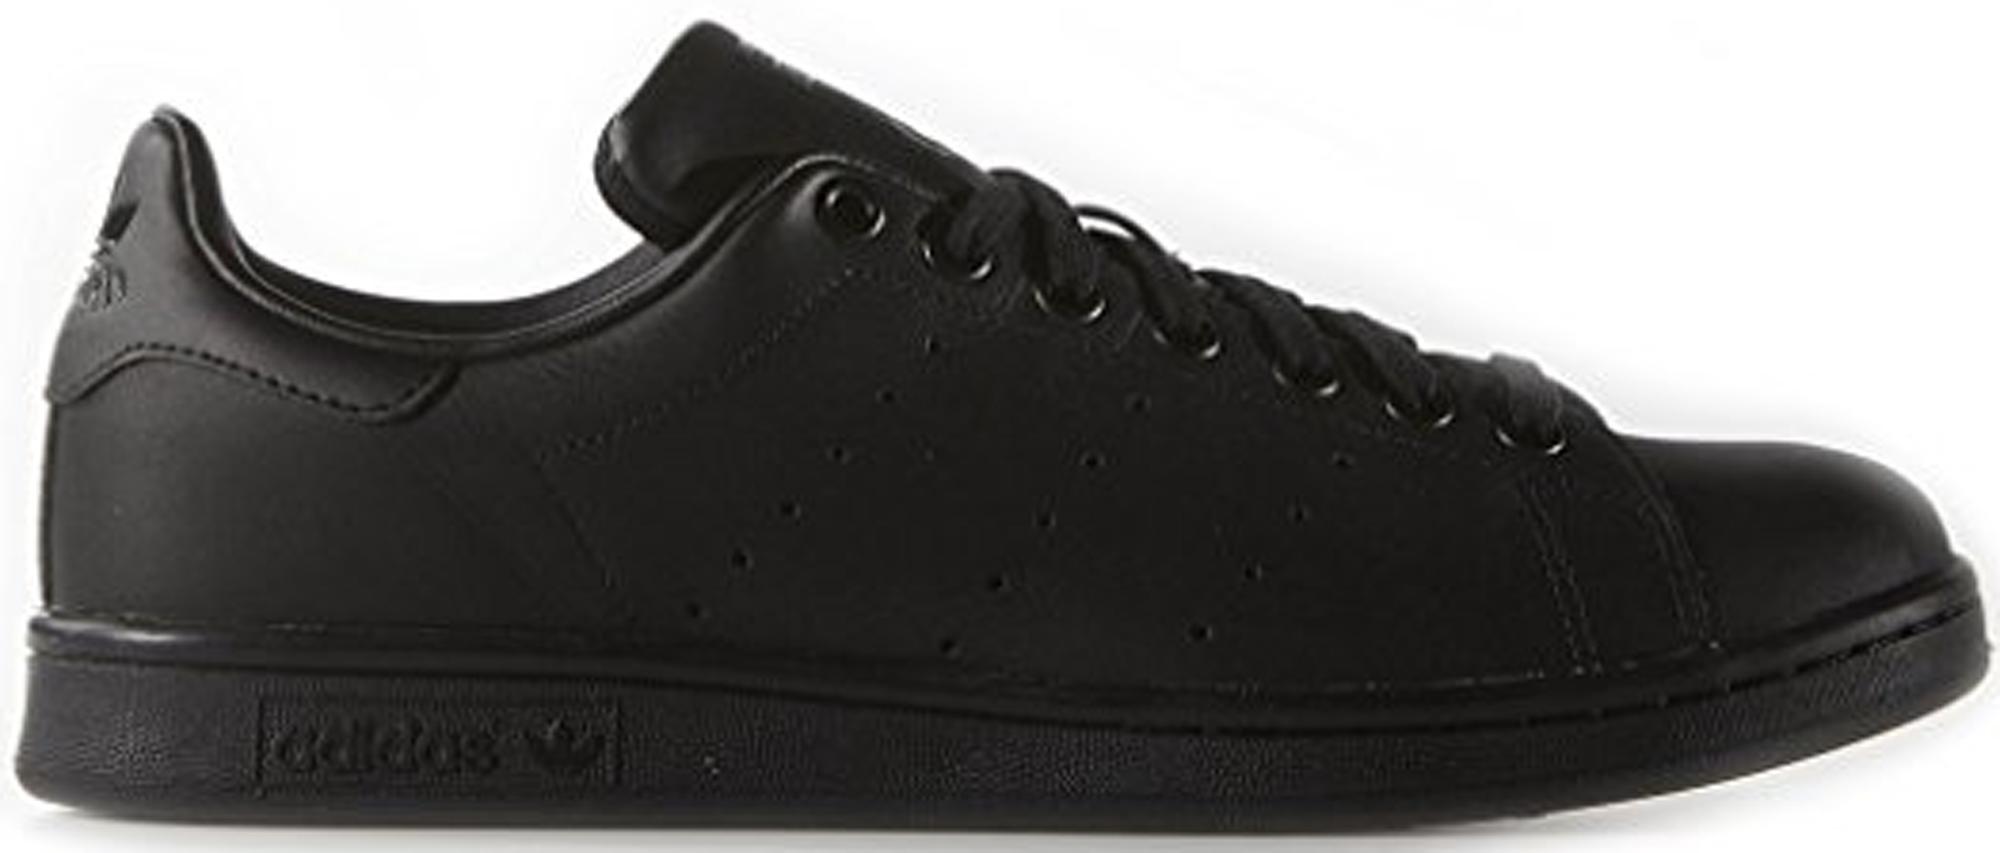 adidas Stan Smith Triple Black